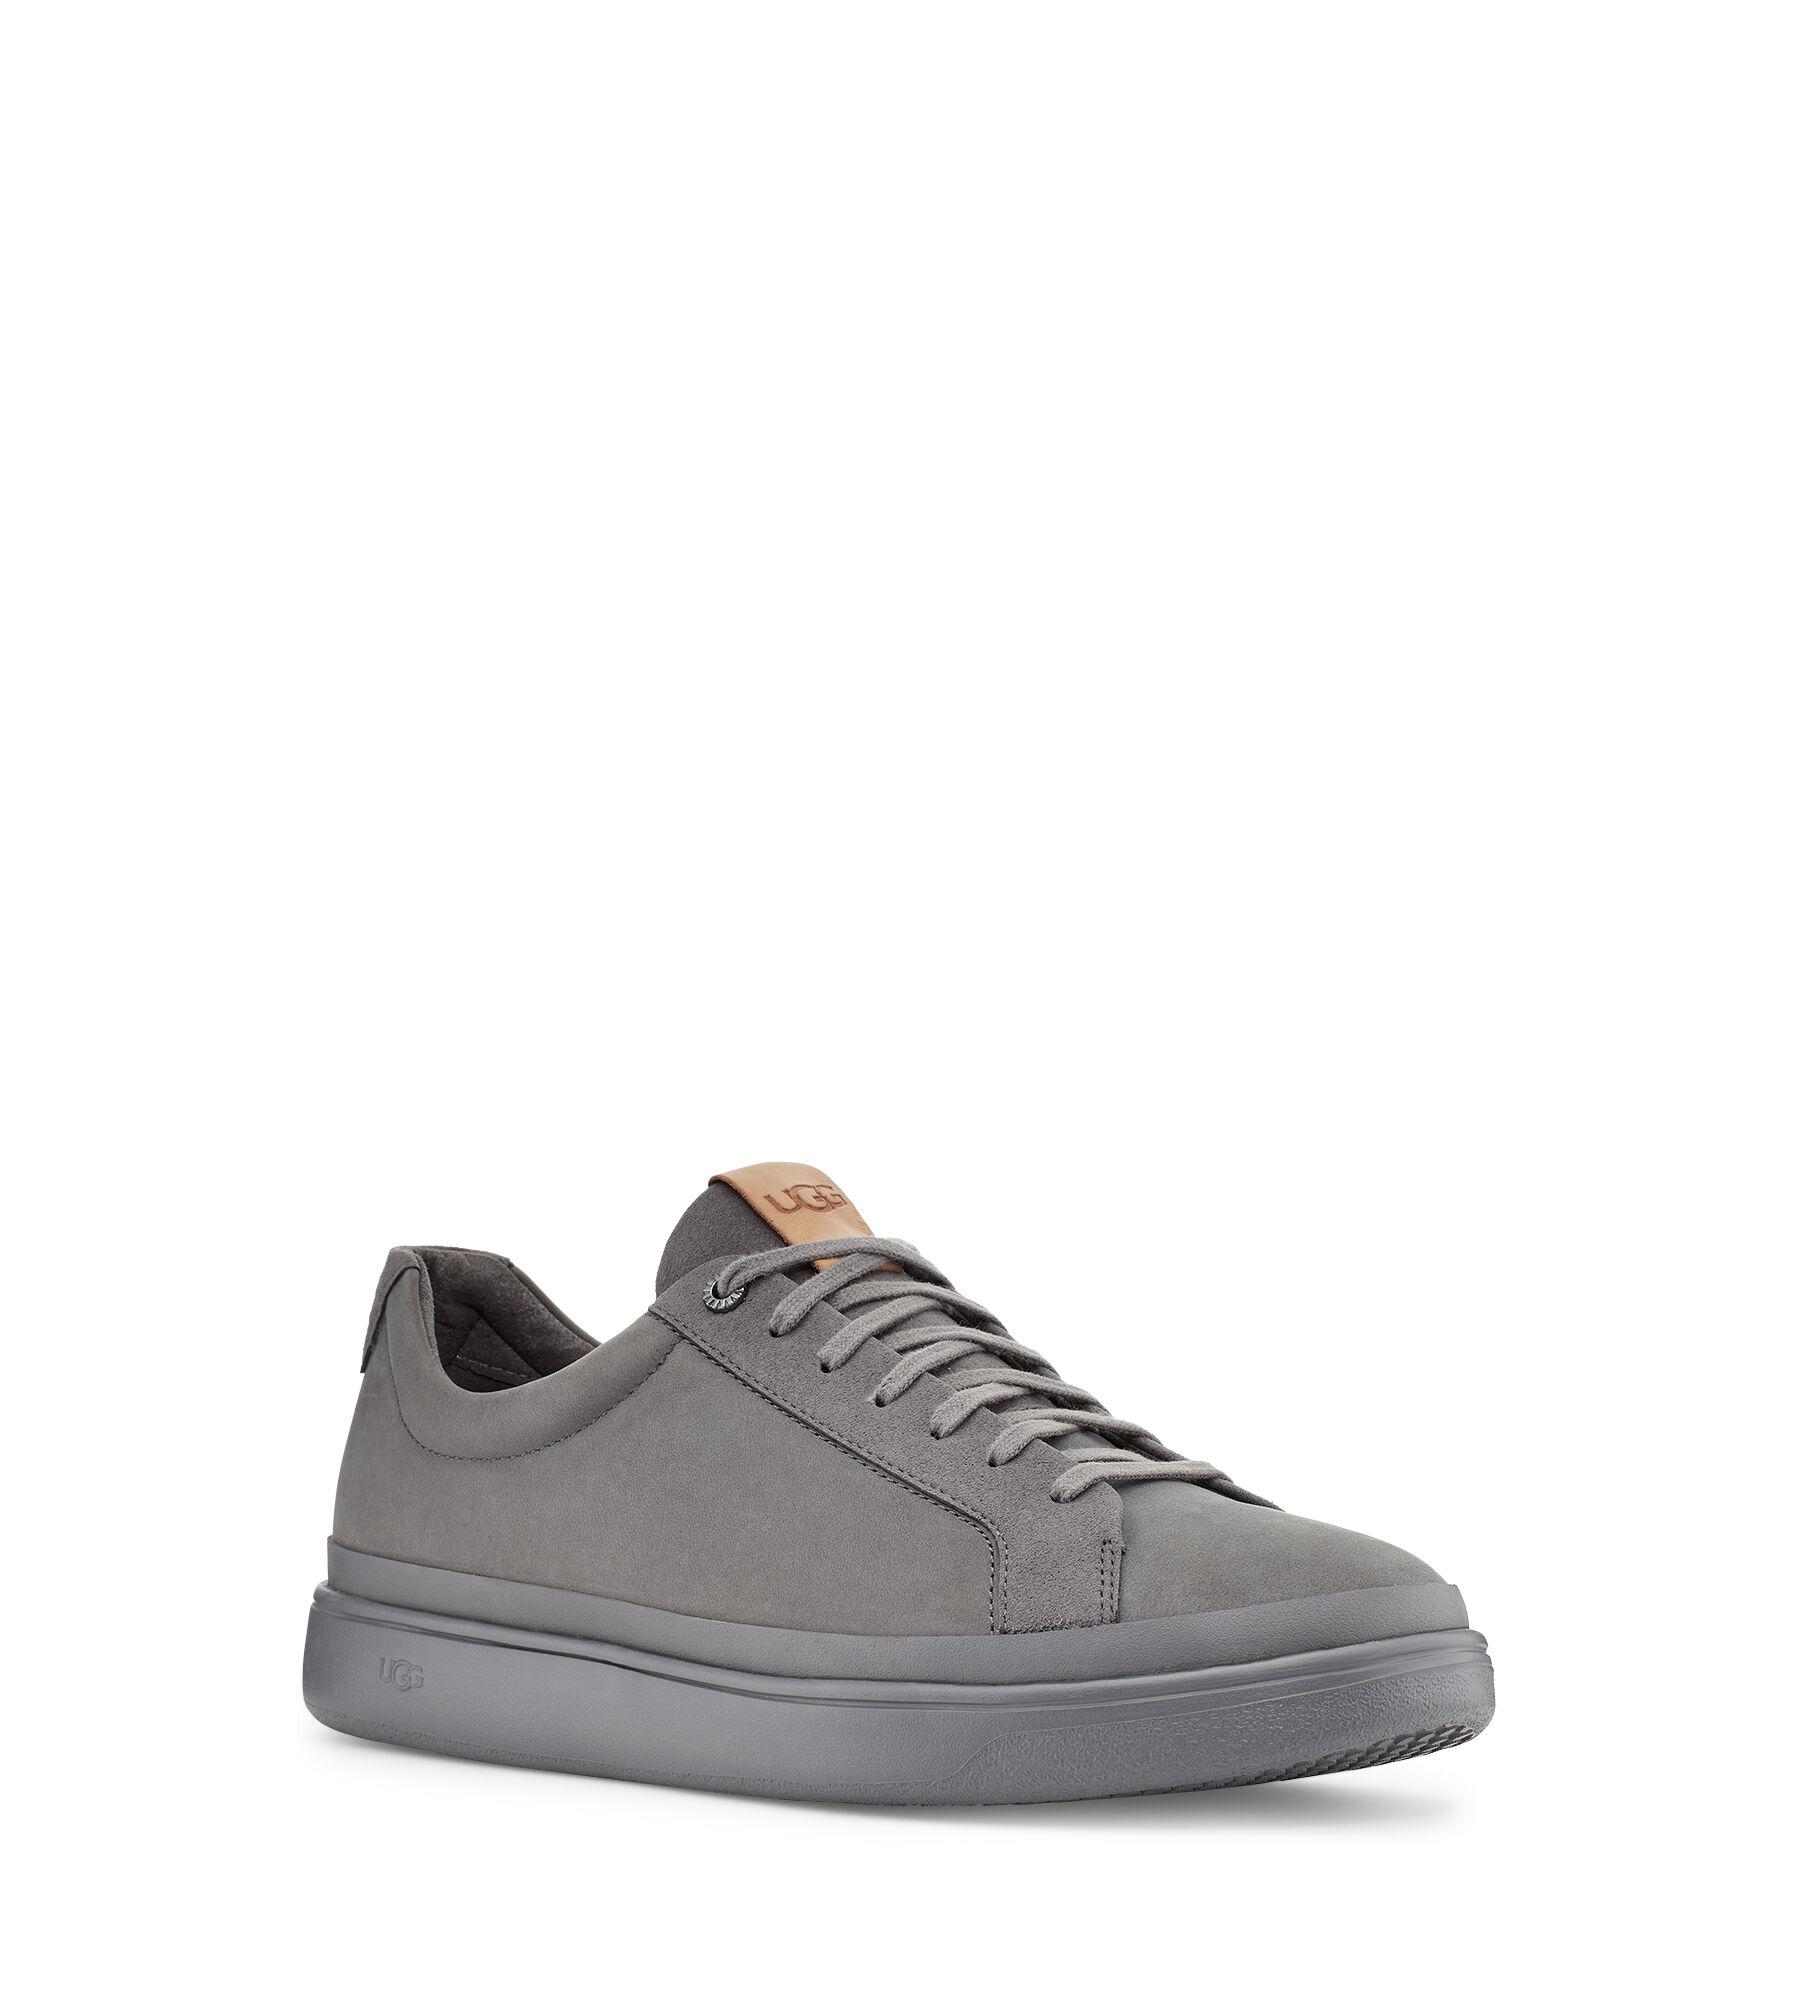 Men's Cali Sneaker Low | UGG Official®